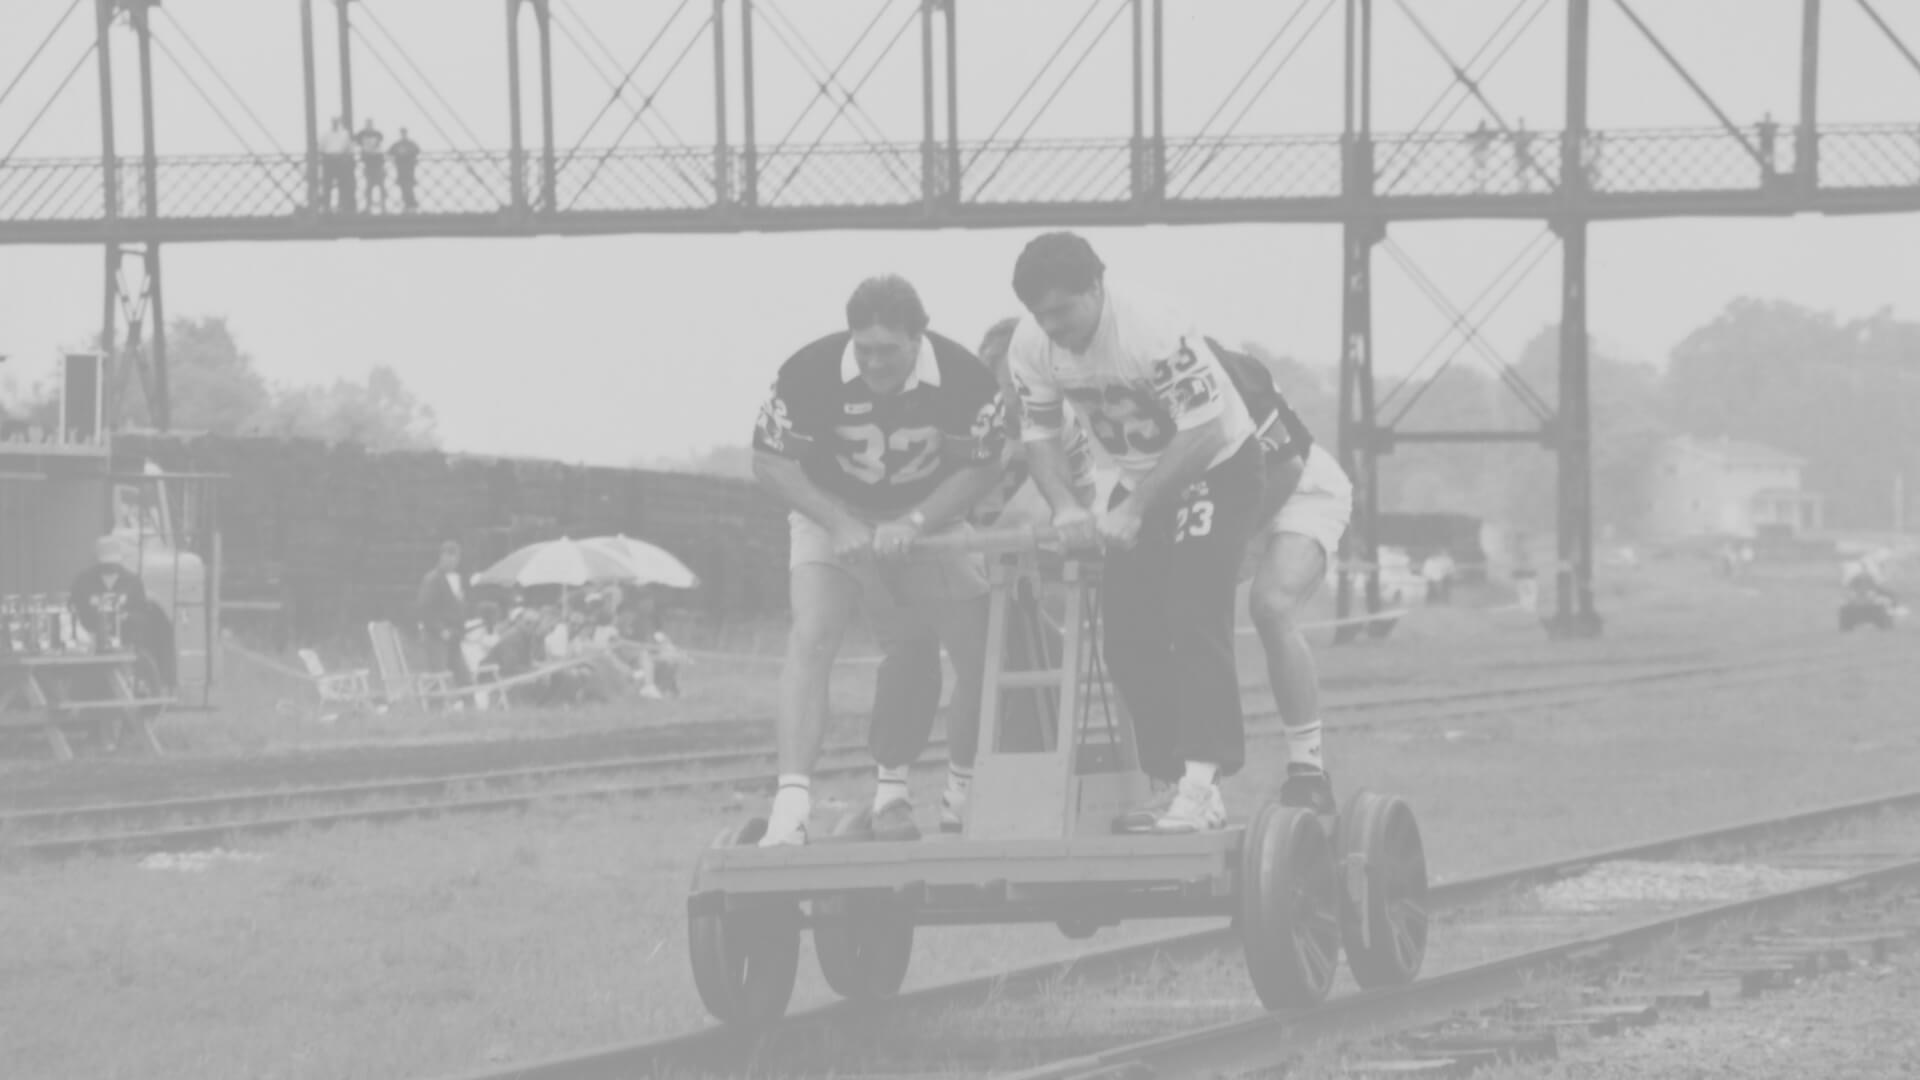 handcar-races-palmerston-1992-bw